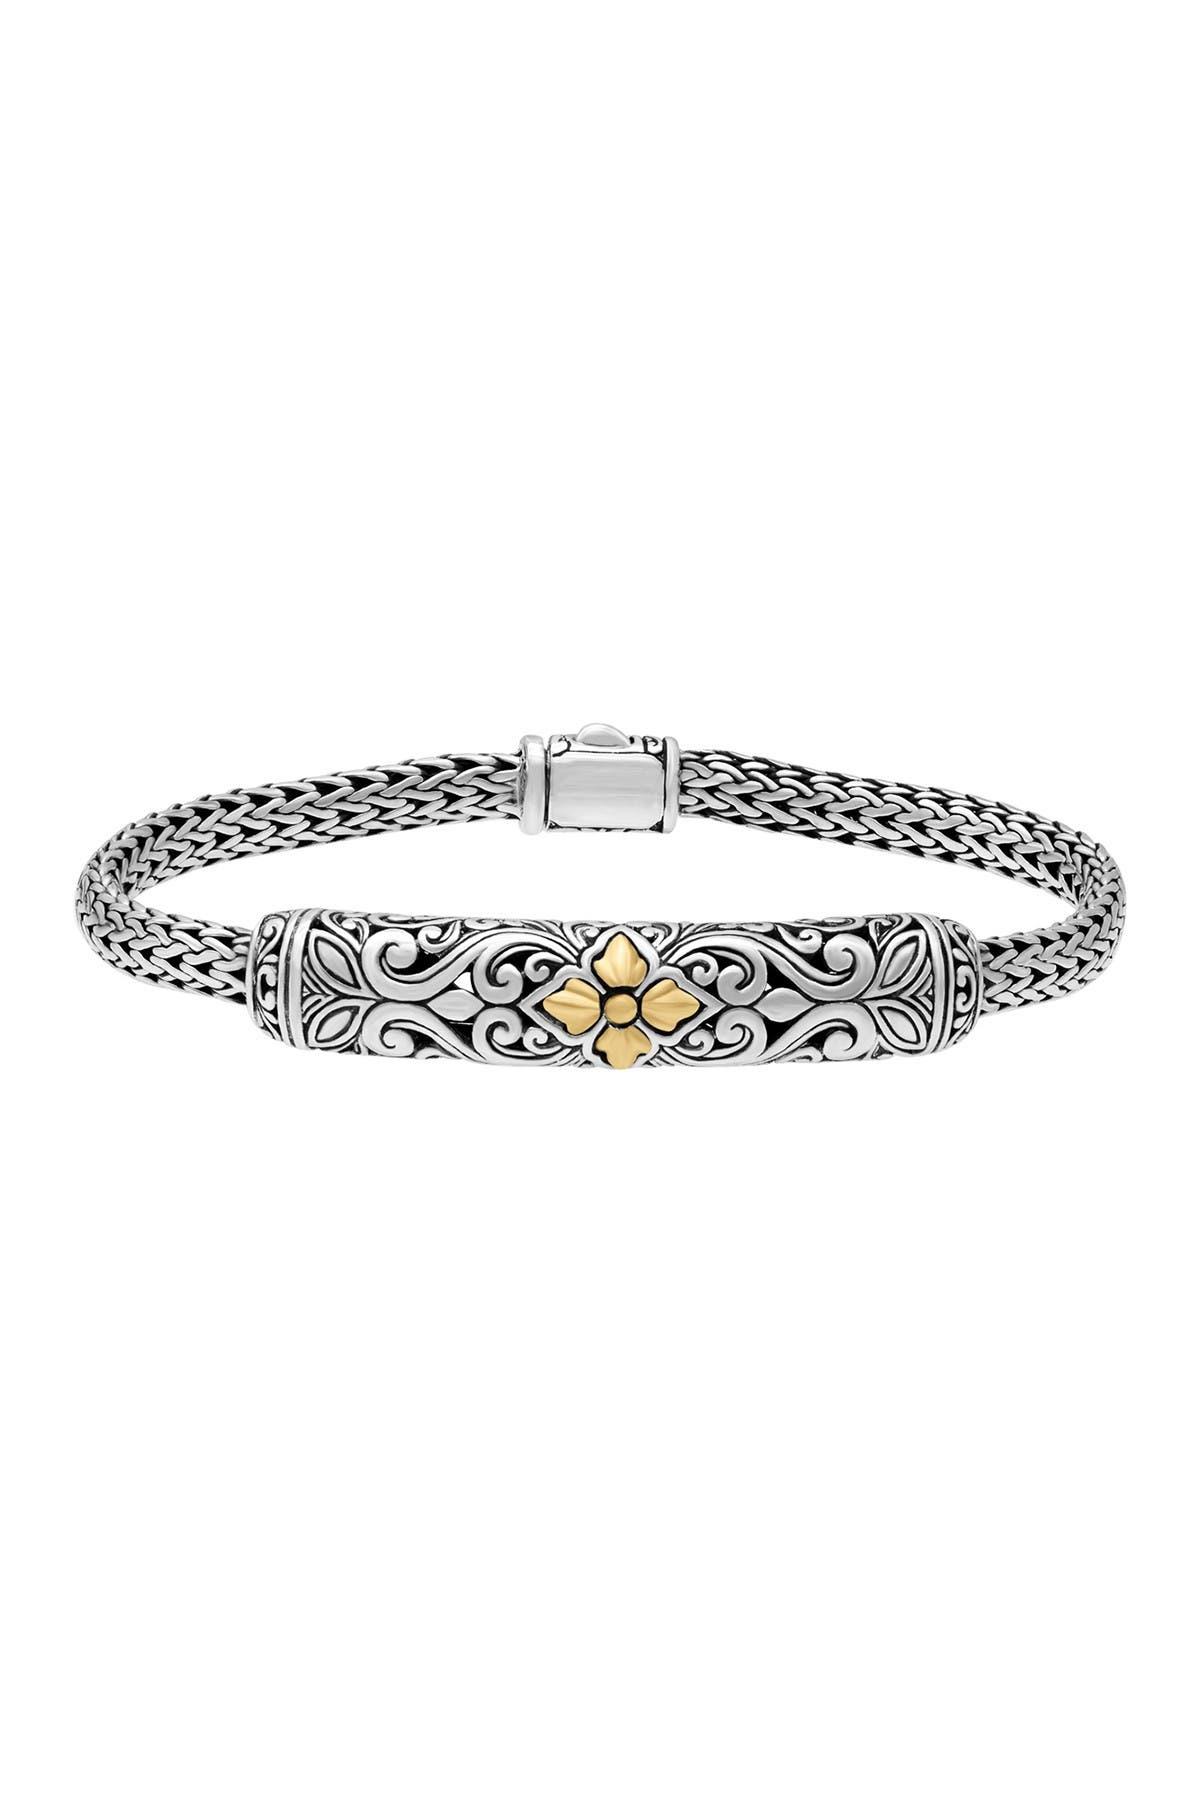 Image of DEVATA 18K Gold & Sterling Silver Bali Filigree Dragon Bone Oval Chain Bracelet